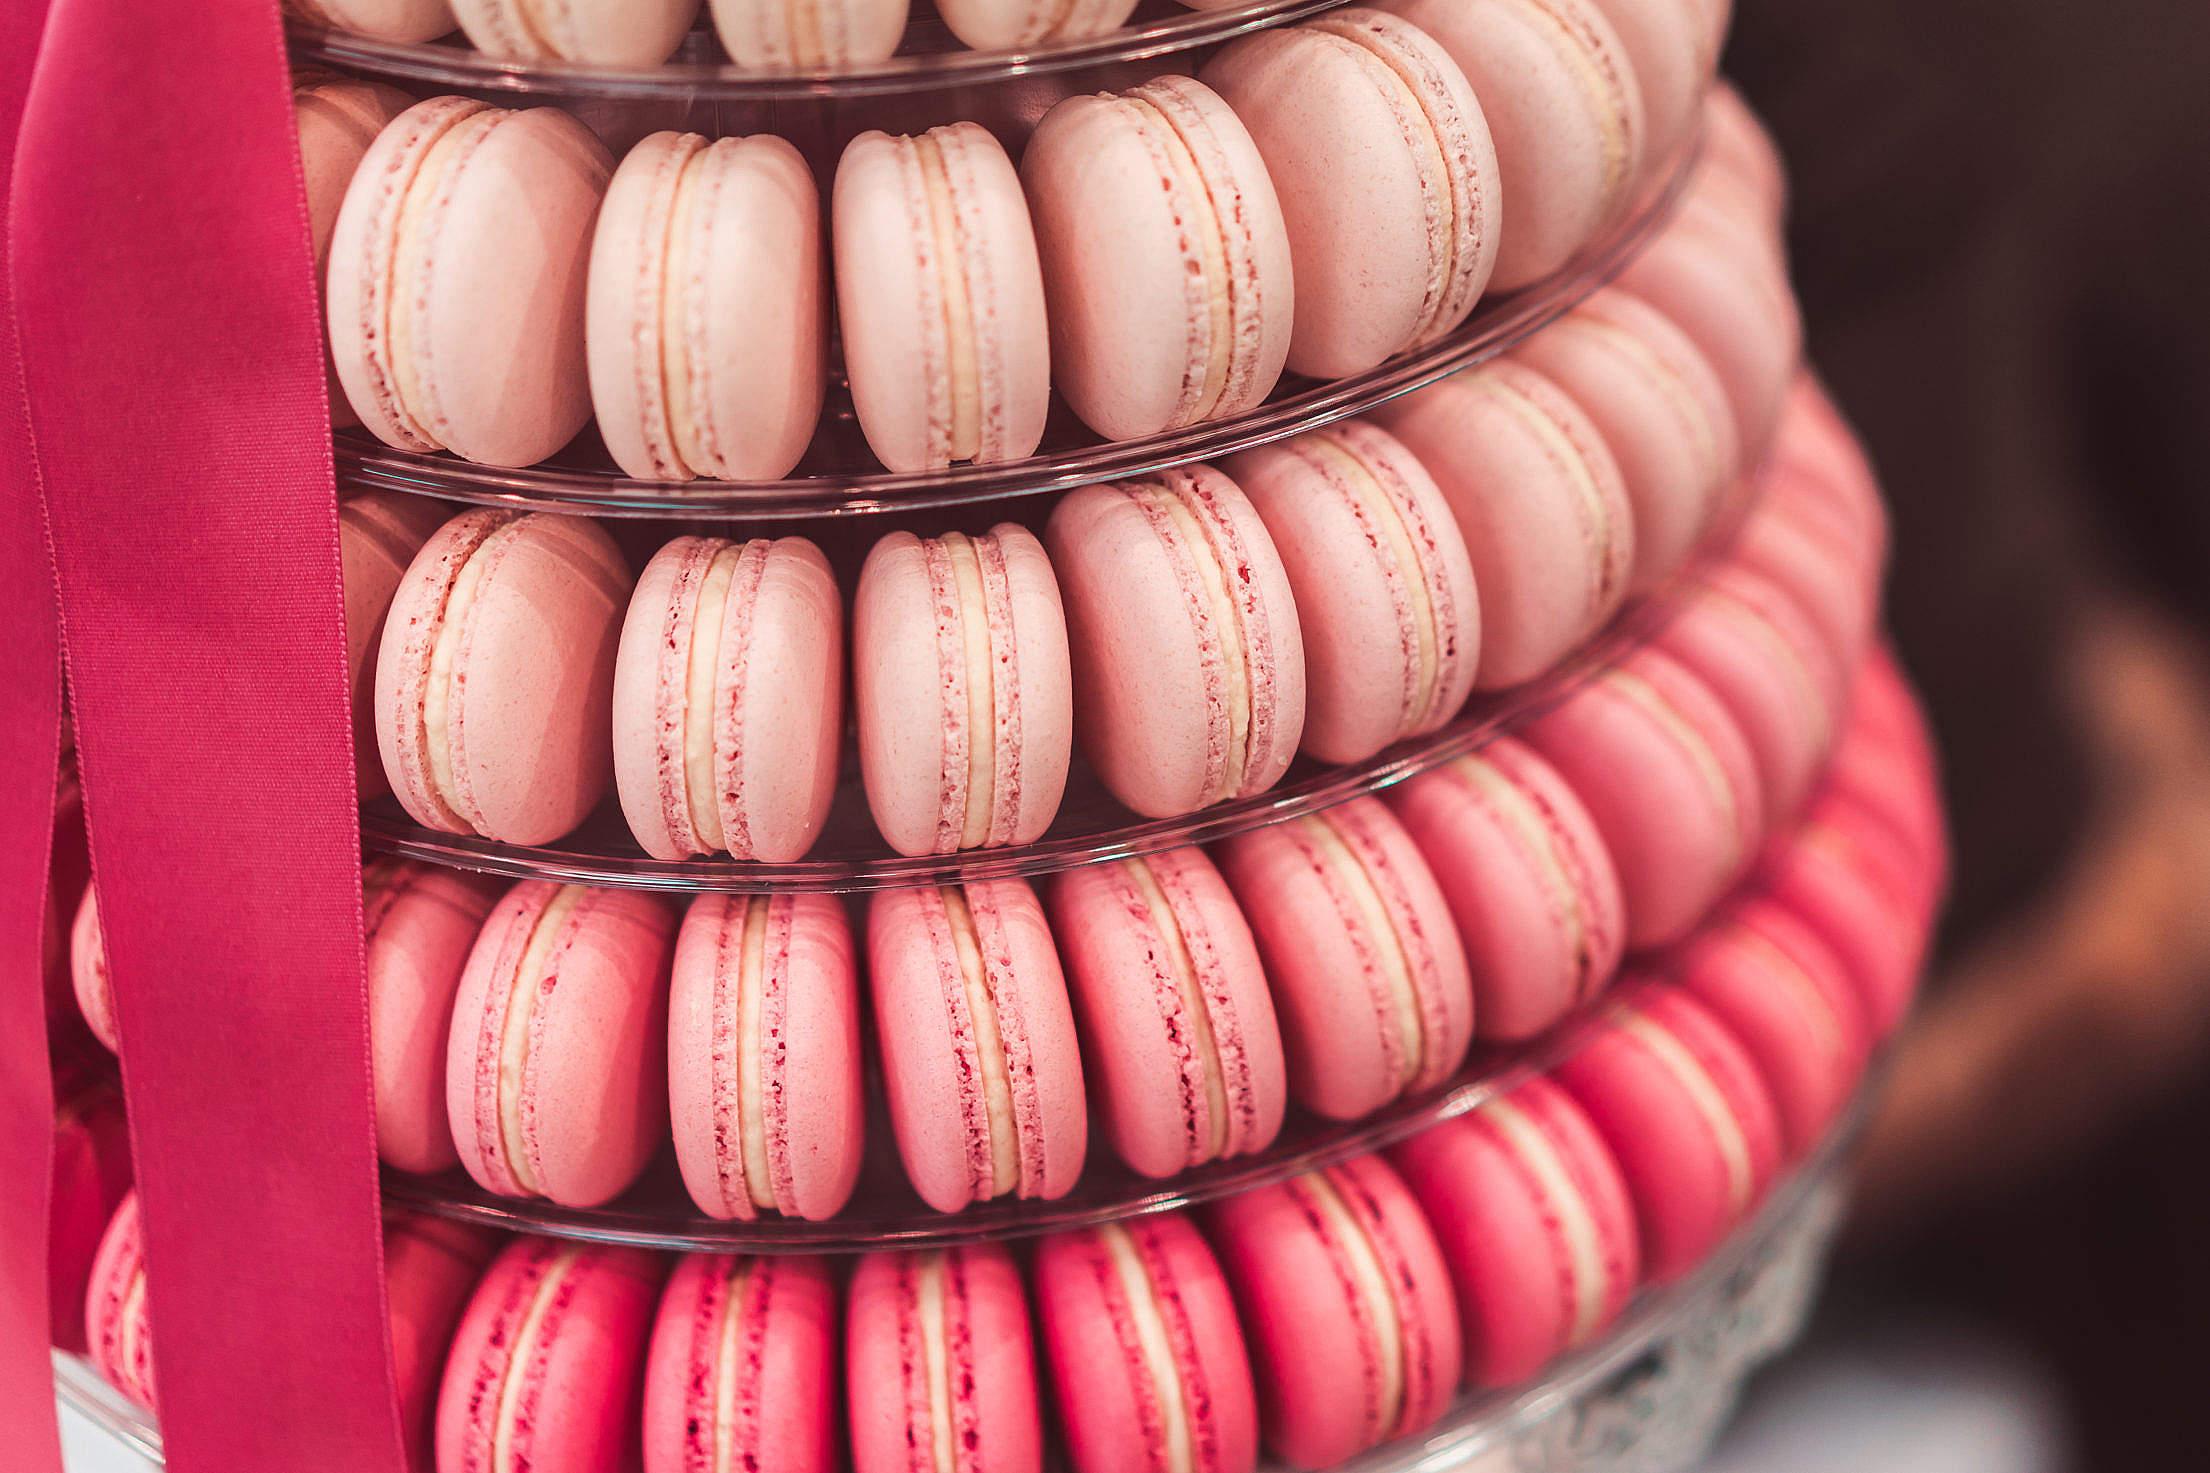 Beautiful Yummy Macaron Cake Pyramid Free Stock Photo